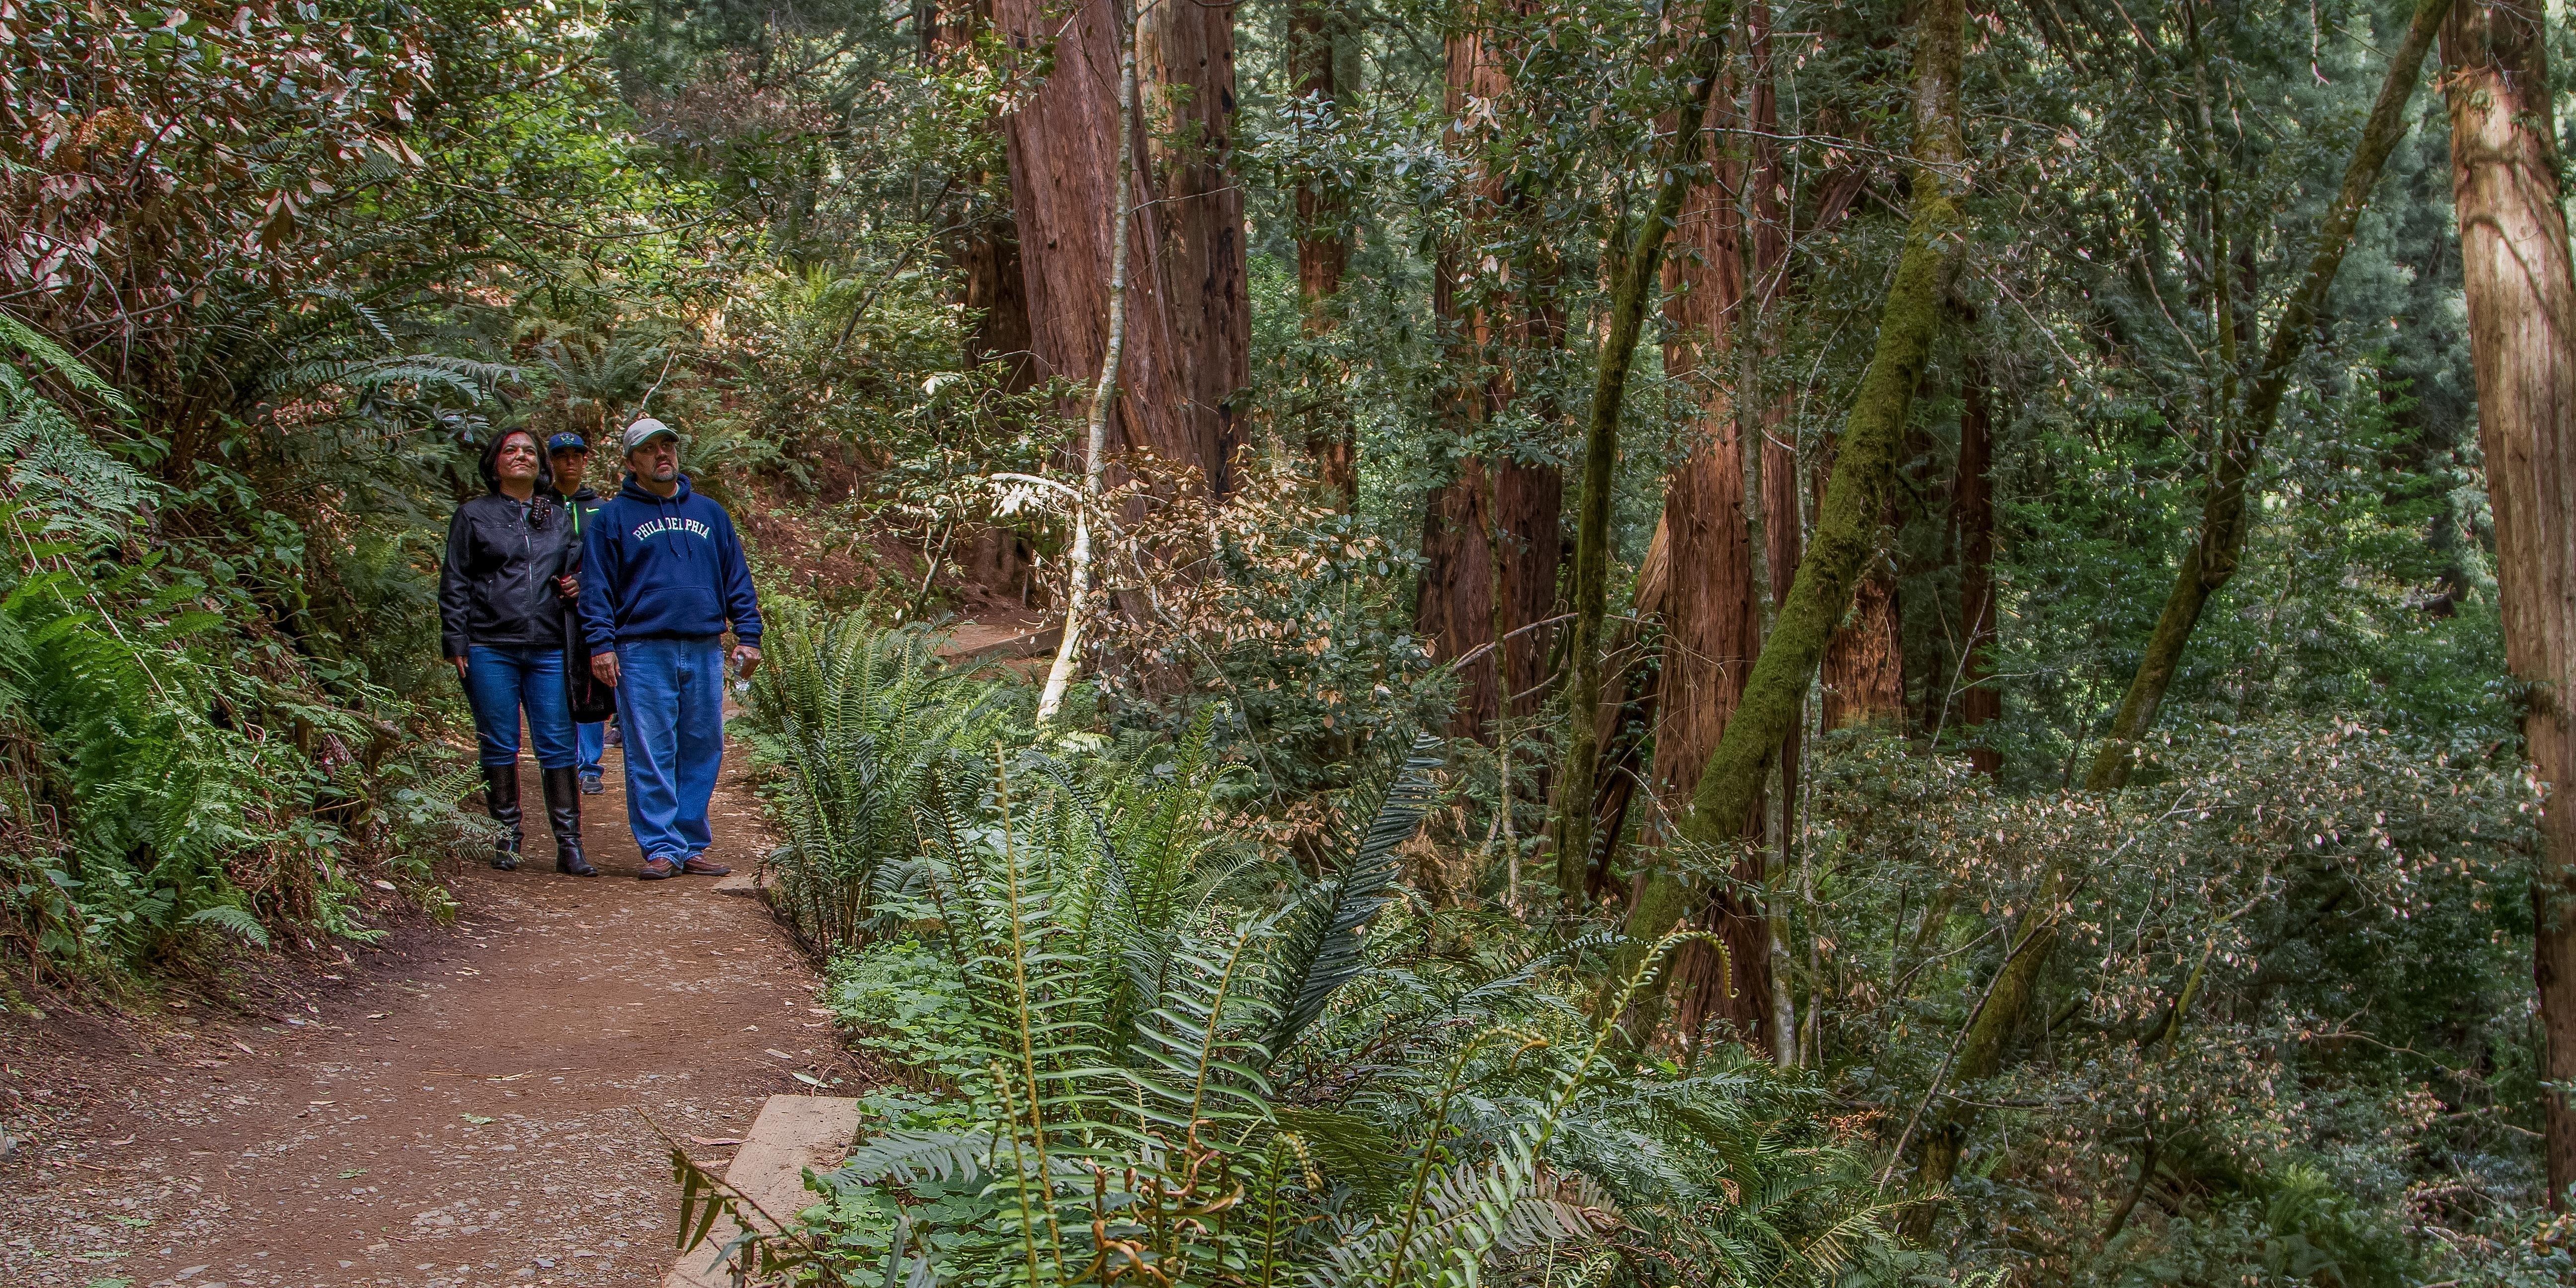 Visitors stroll through Muir Woods